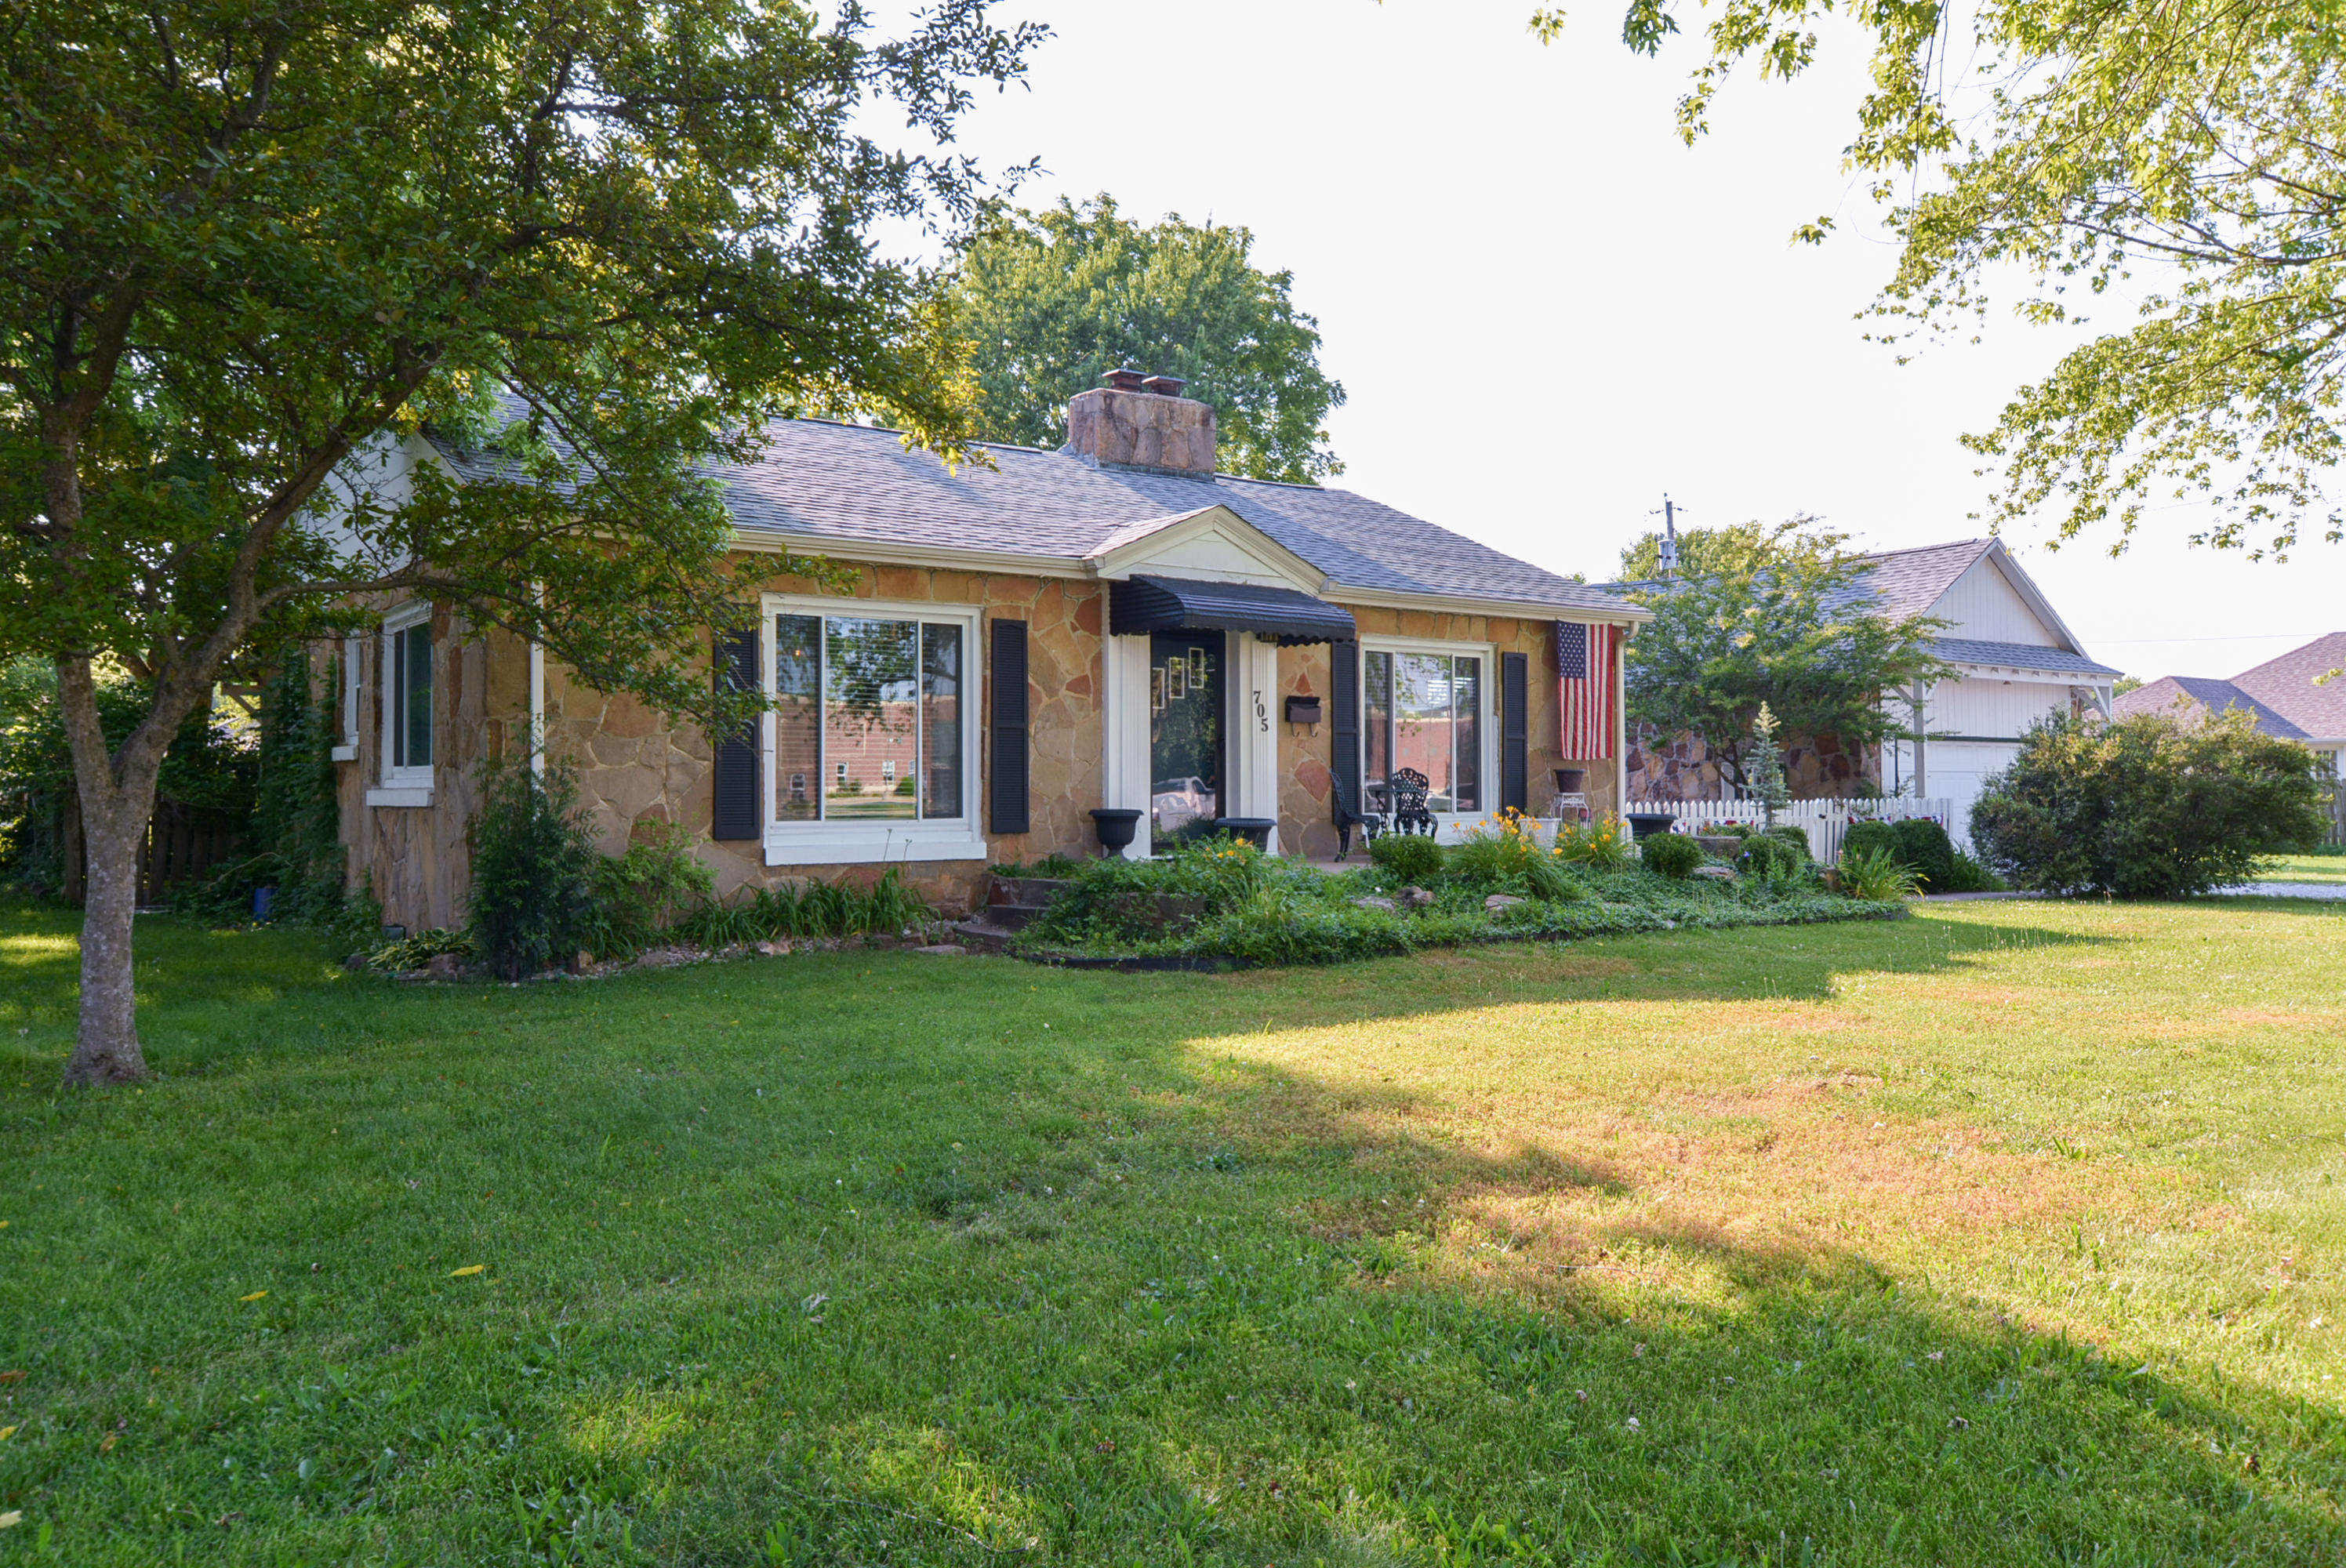 Property for sale at 705 North Main, Republic,  Missouri 65738